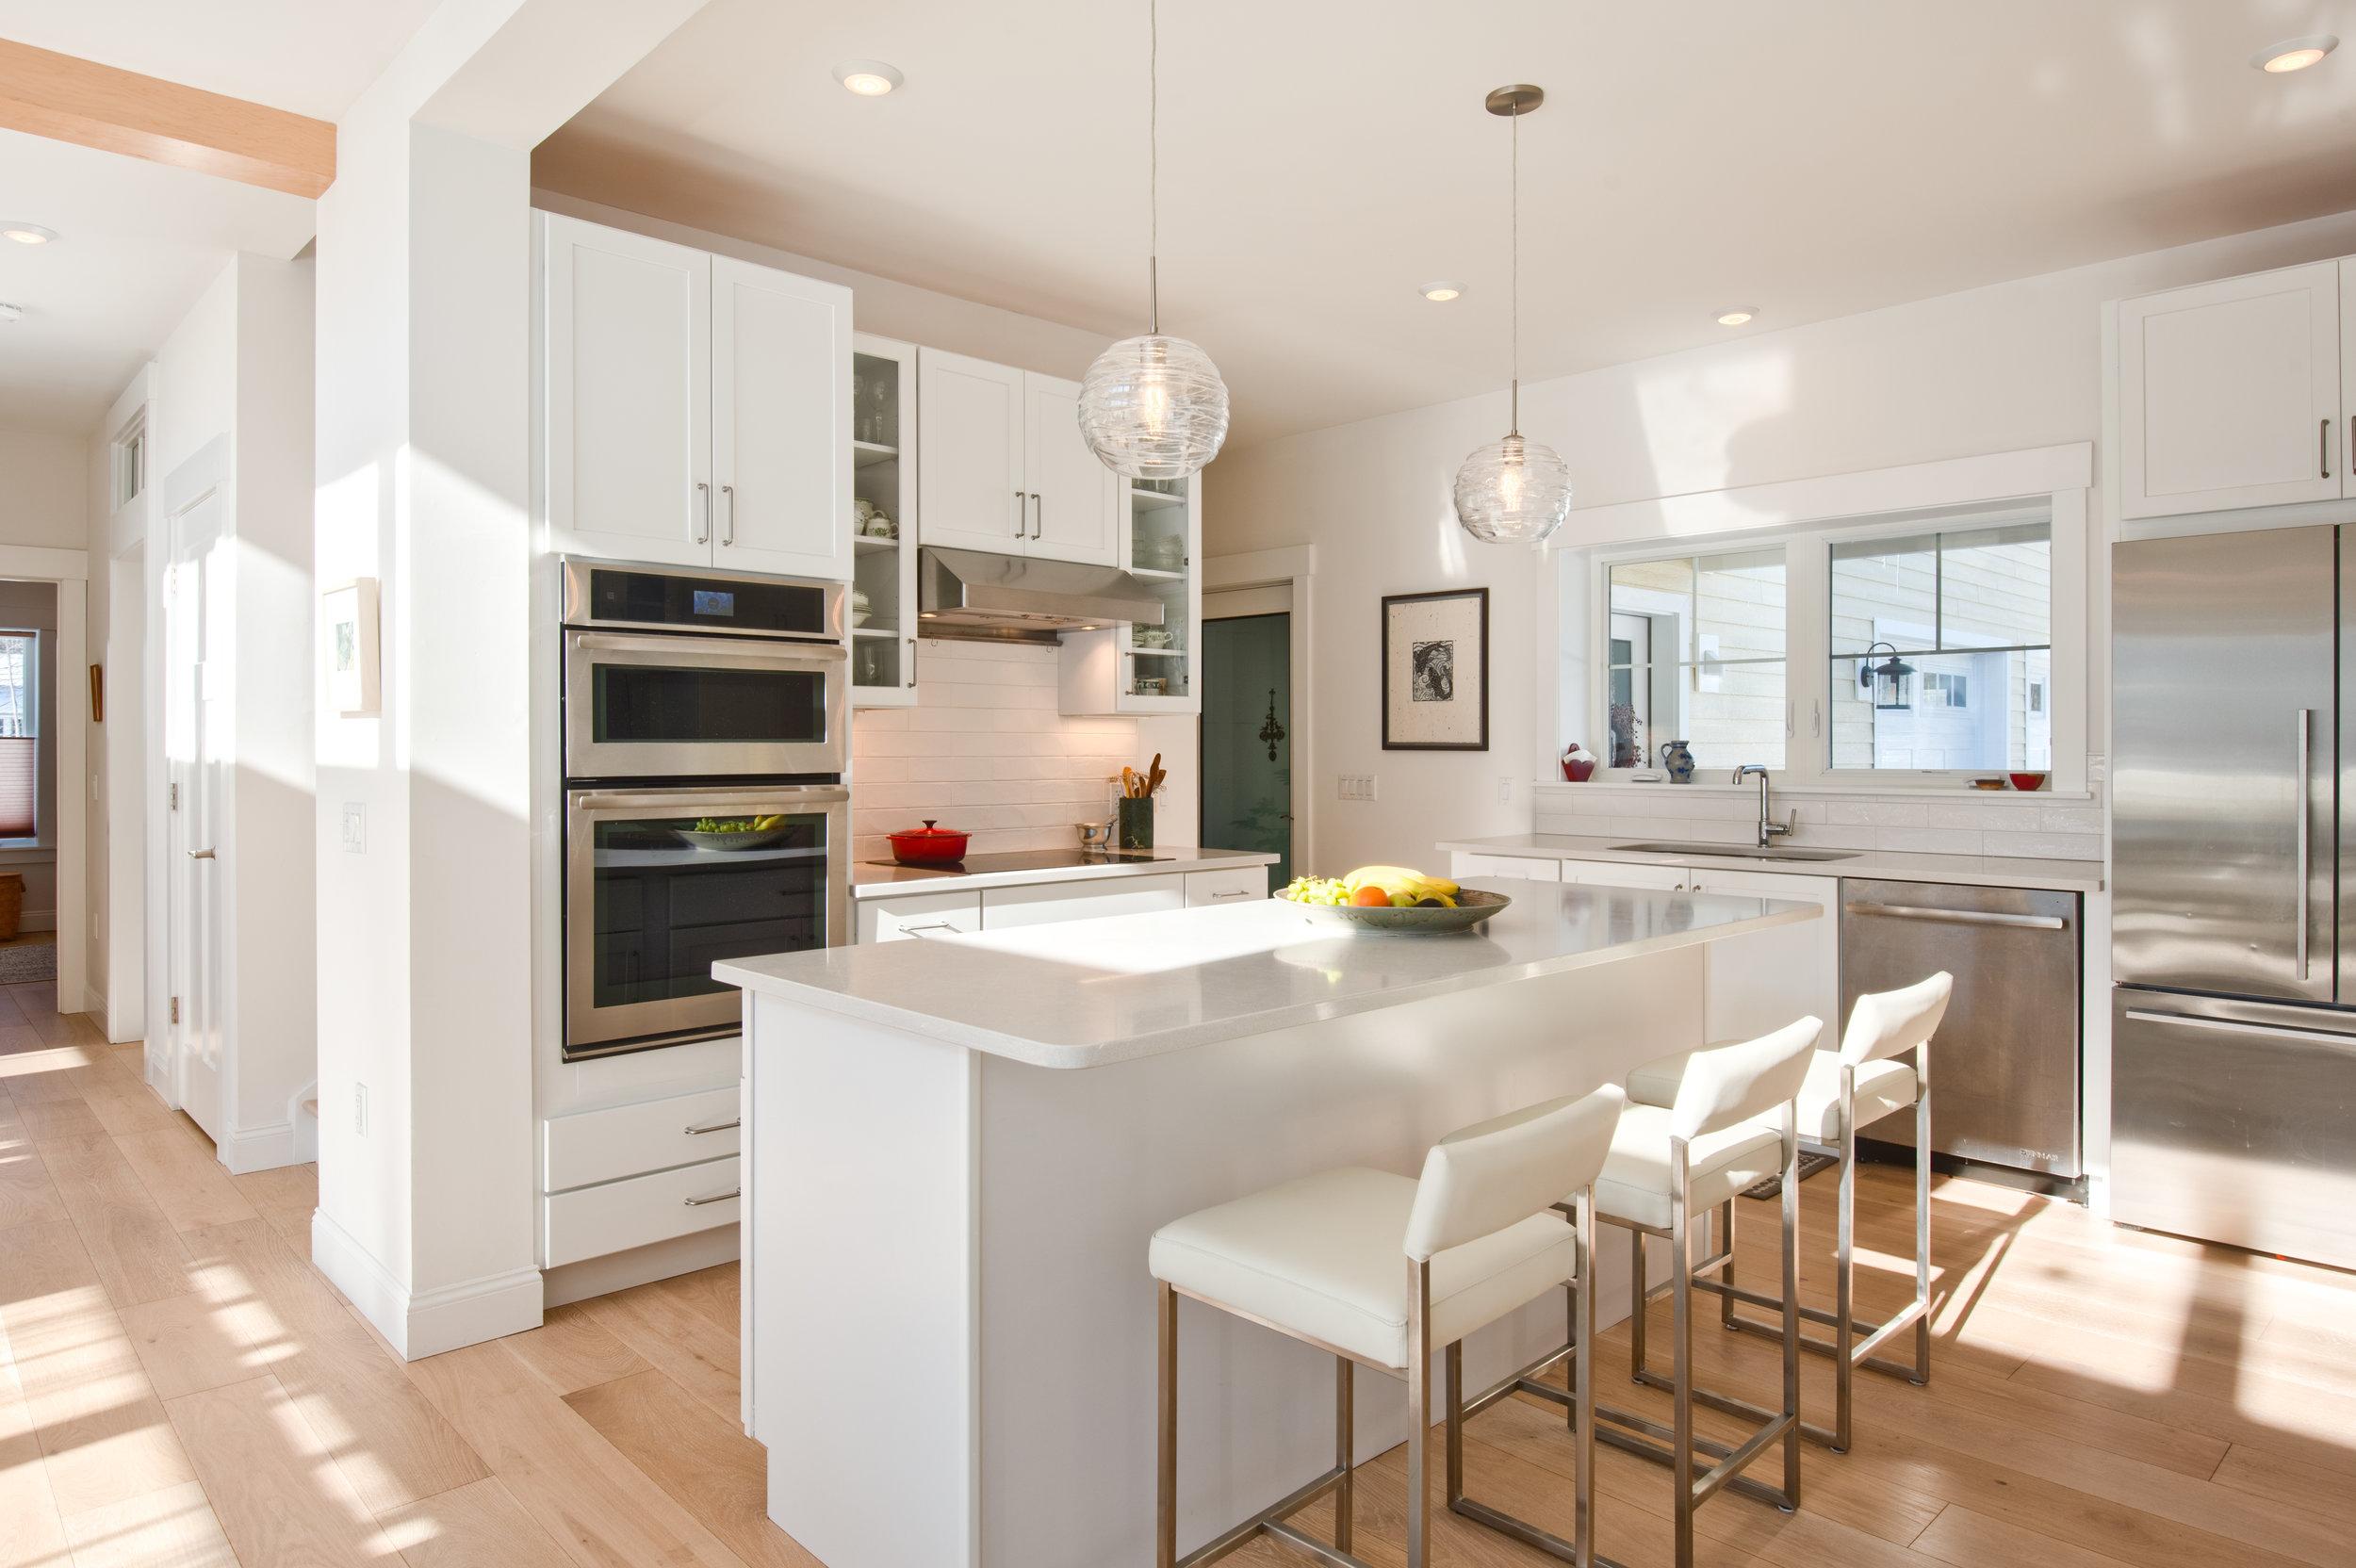 pre-fab-zero-energy-home-maine-brightbuilt-007.jpg